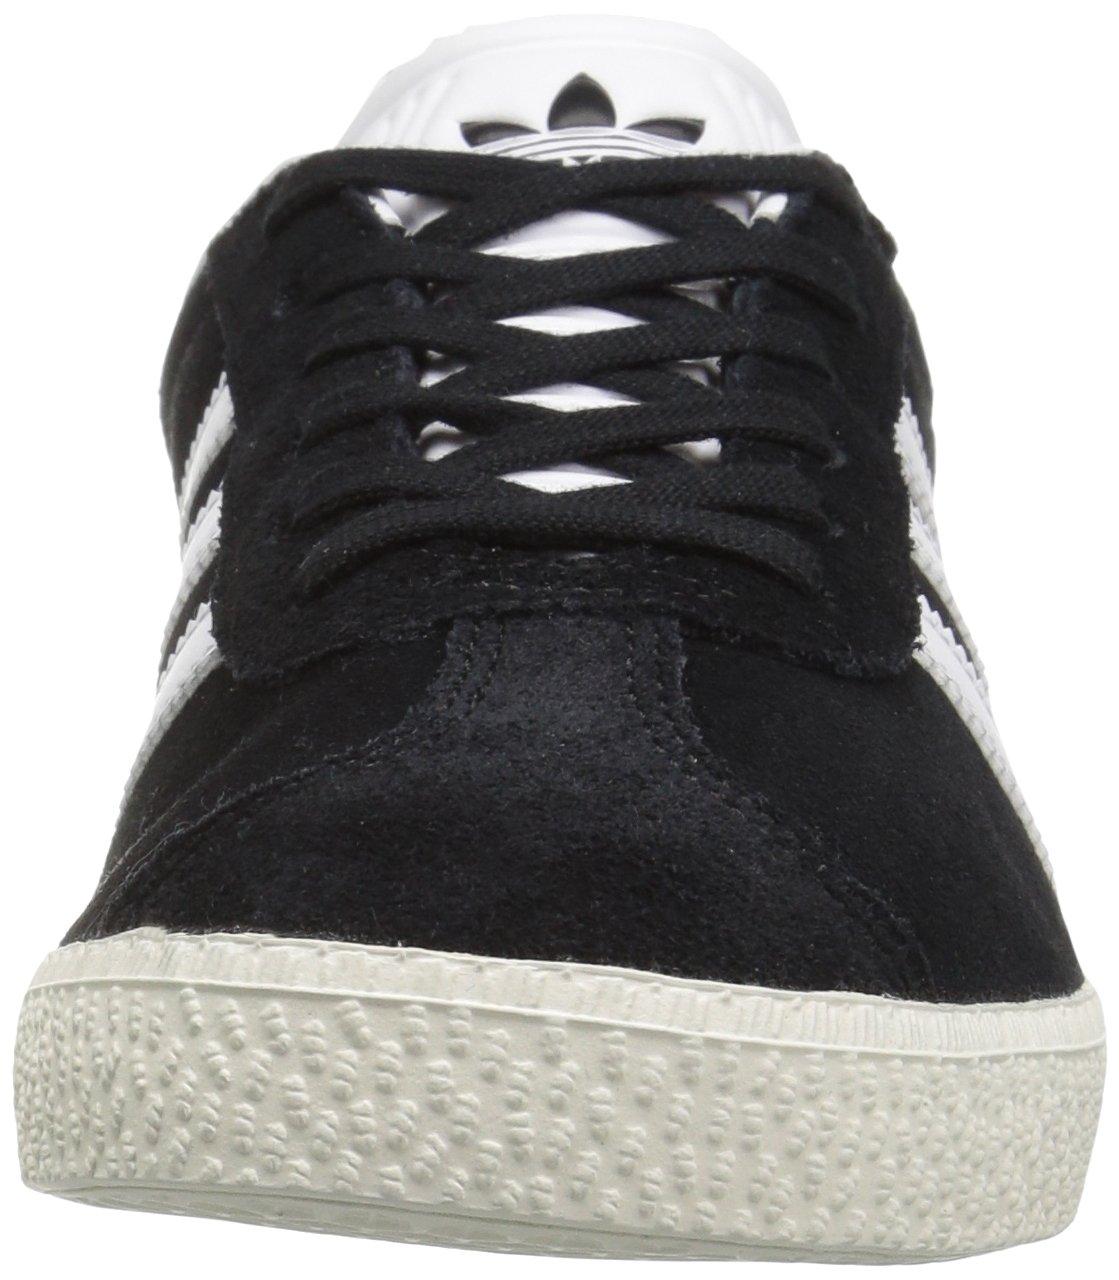 Adidas Gazelle J, J, Zapatillas J, Unisex Zapatillas Unisex Niños B01IE6ZA0Q J, Negro 2d22d7a - accademiadellescienzedellumbria.xyz